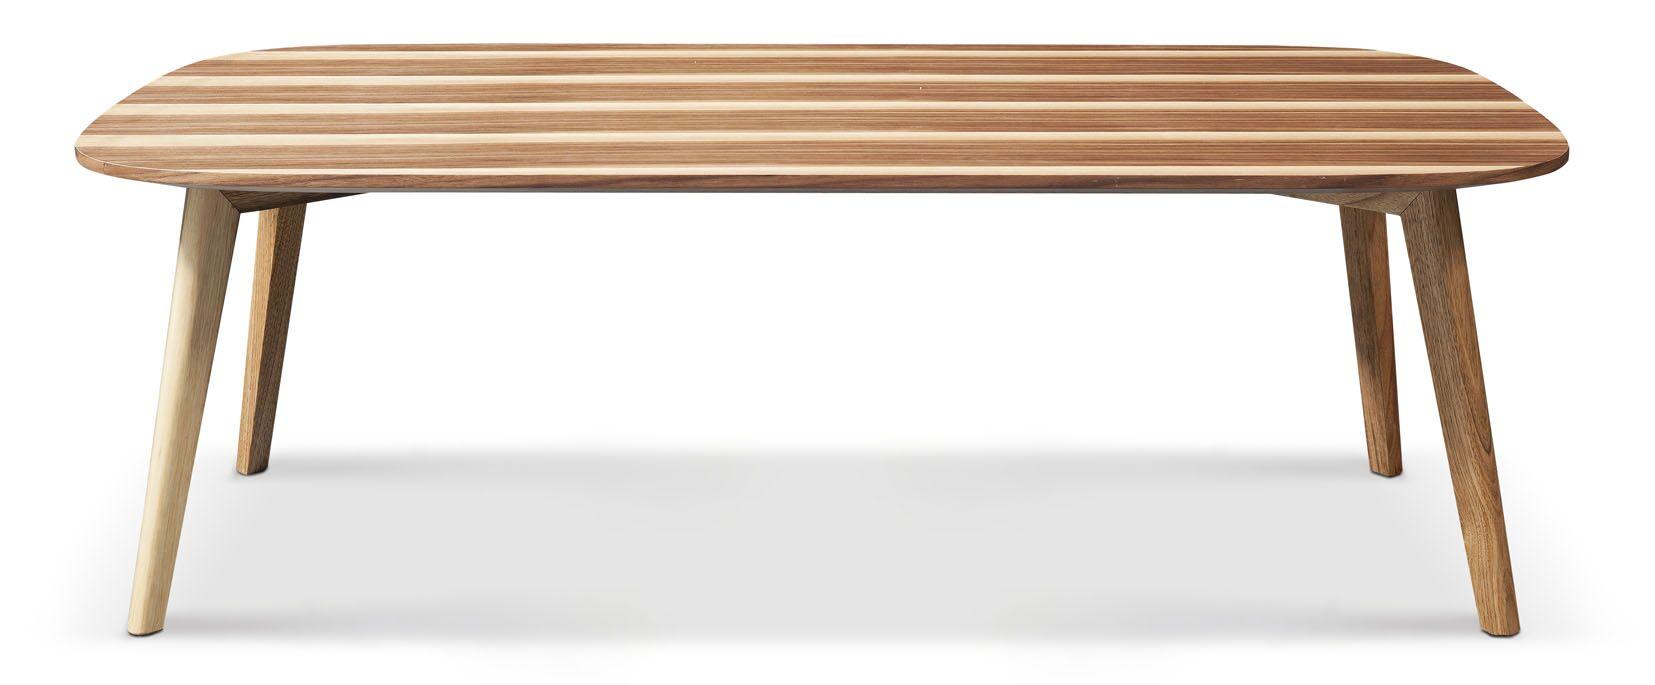 Boss Coffee Table Color: Light Walnut, Size: 16